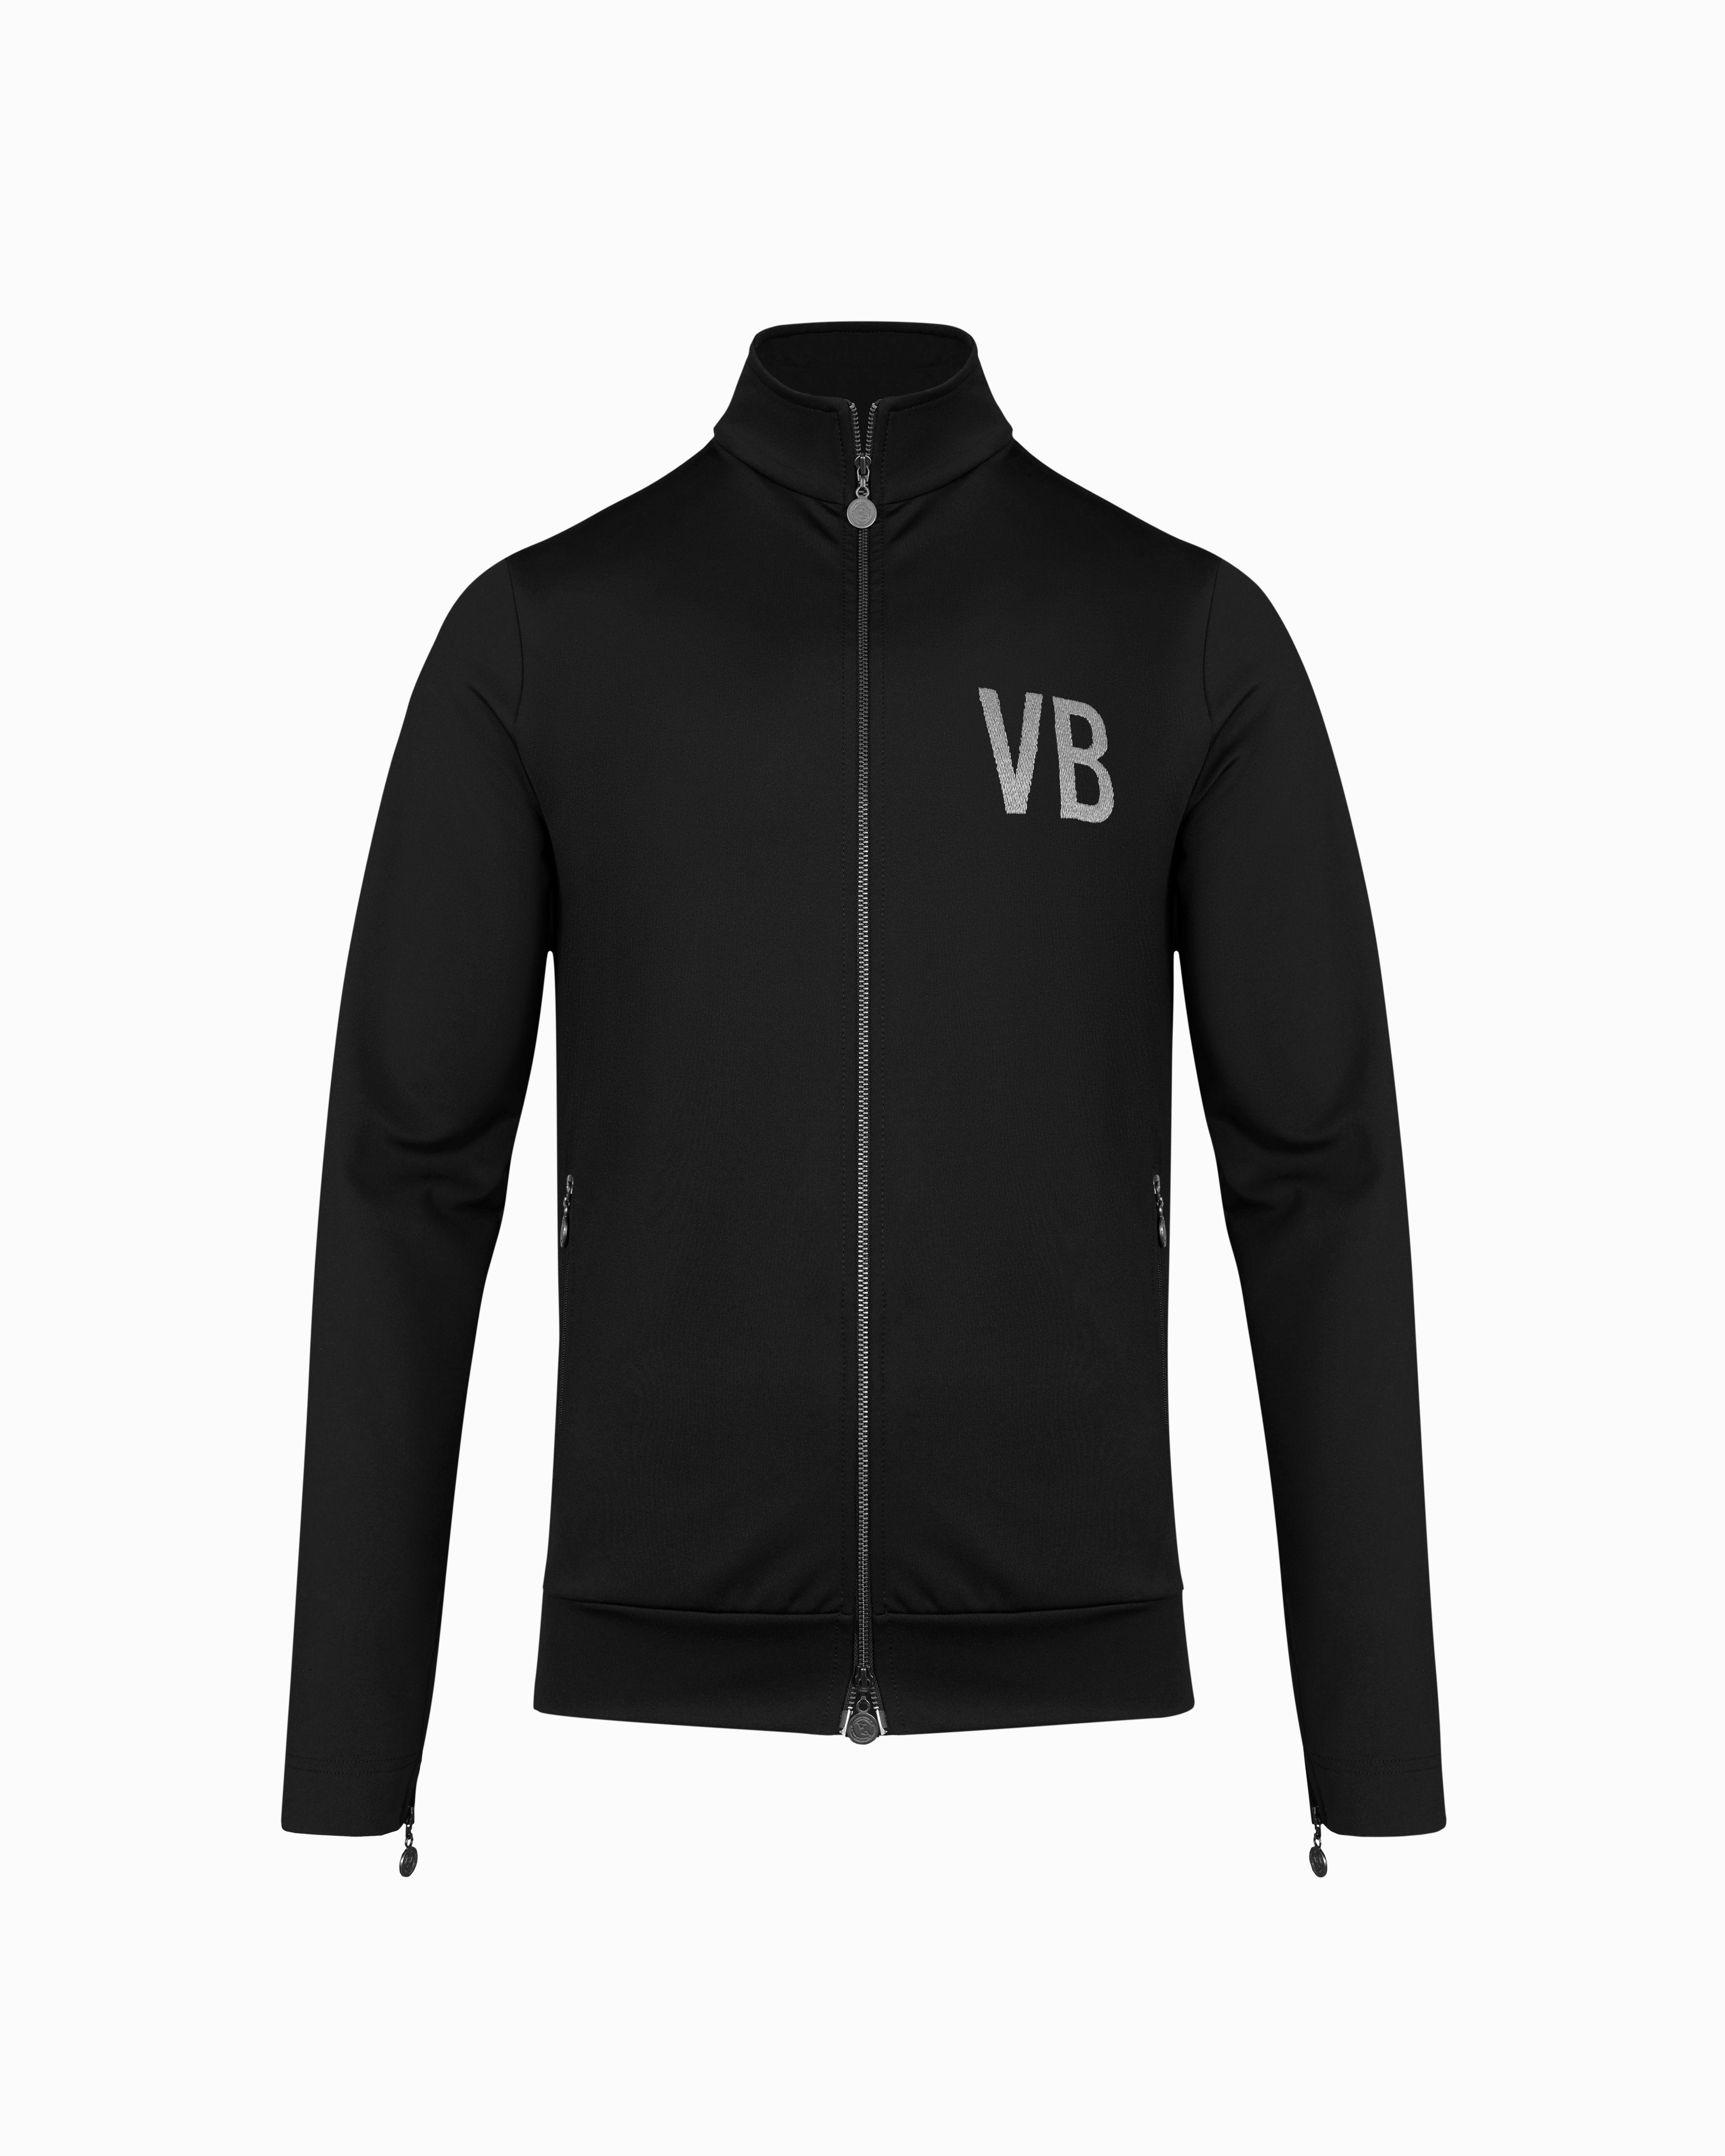 VB Track Jacket